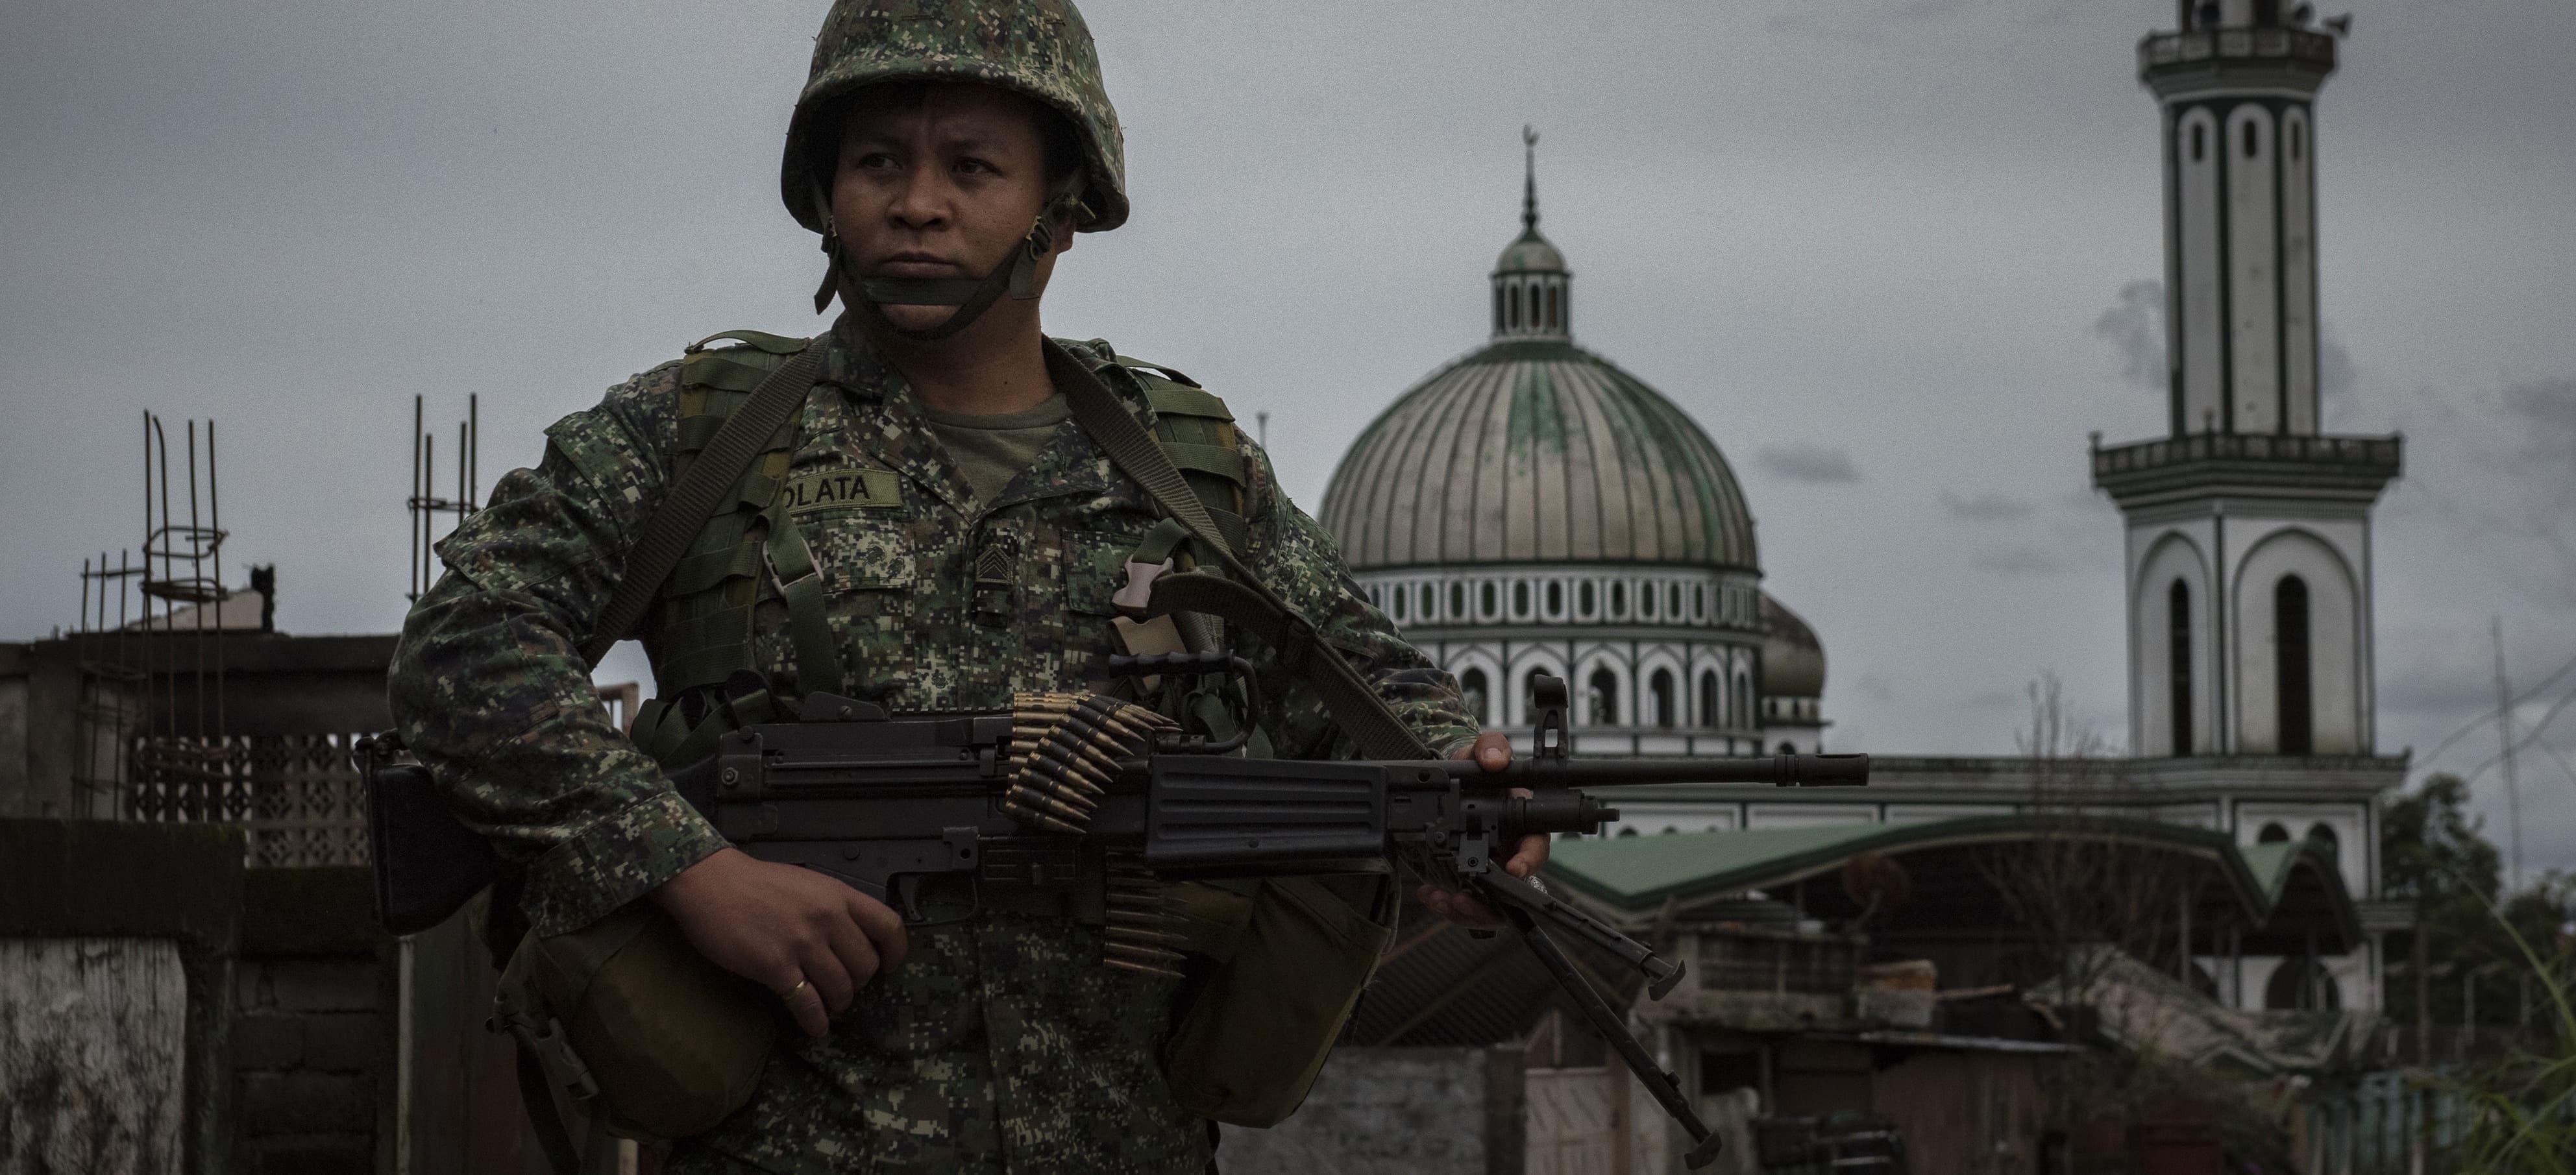 Photo: Jes Aznar/Getty Images